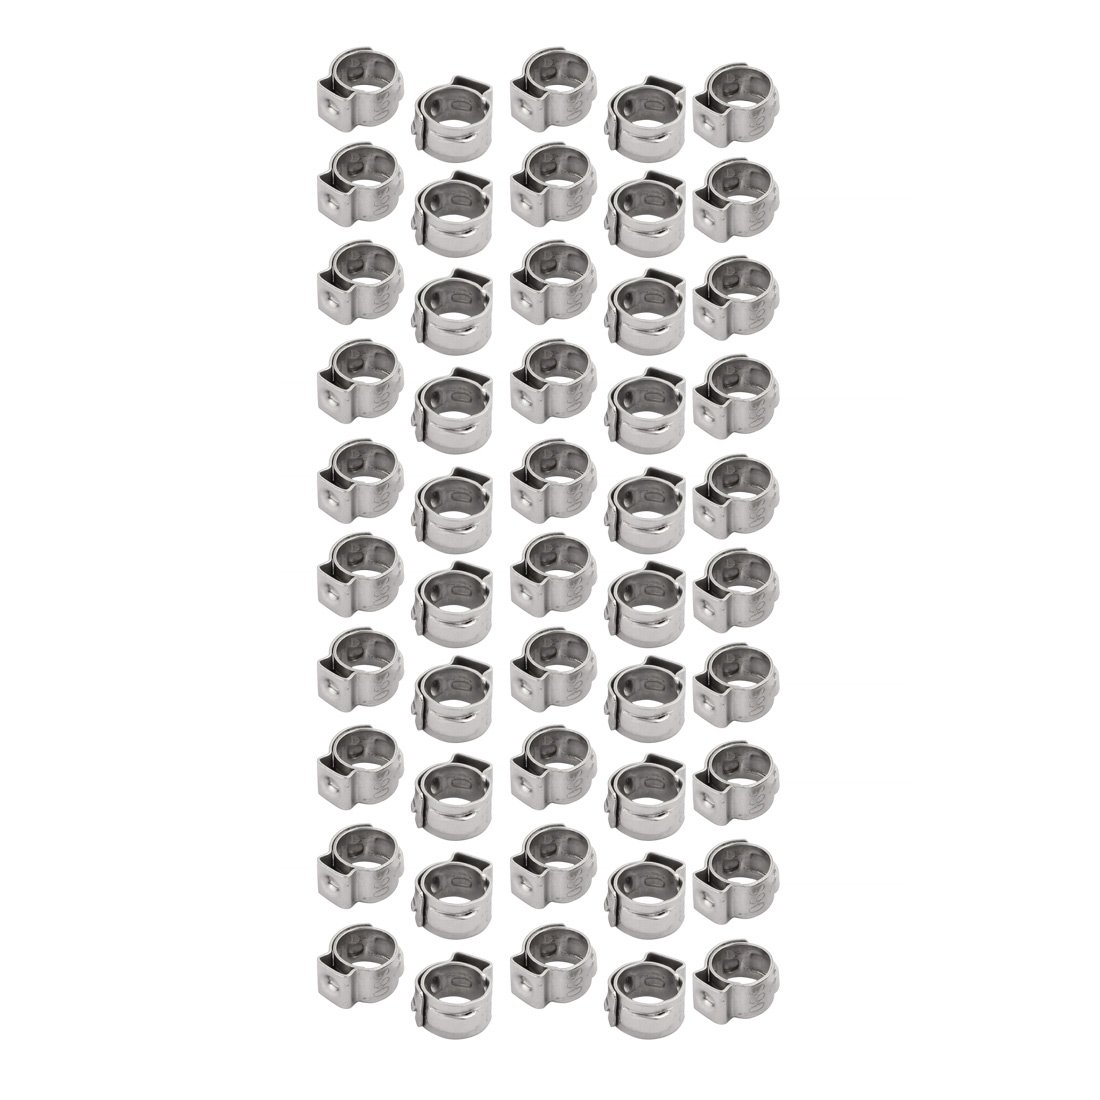 sourcing map -6.55, 3 mm mm 304 acciaio inossidabile tubo regolabile Fascette stringitubo Colore Argento 50pcs